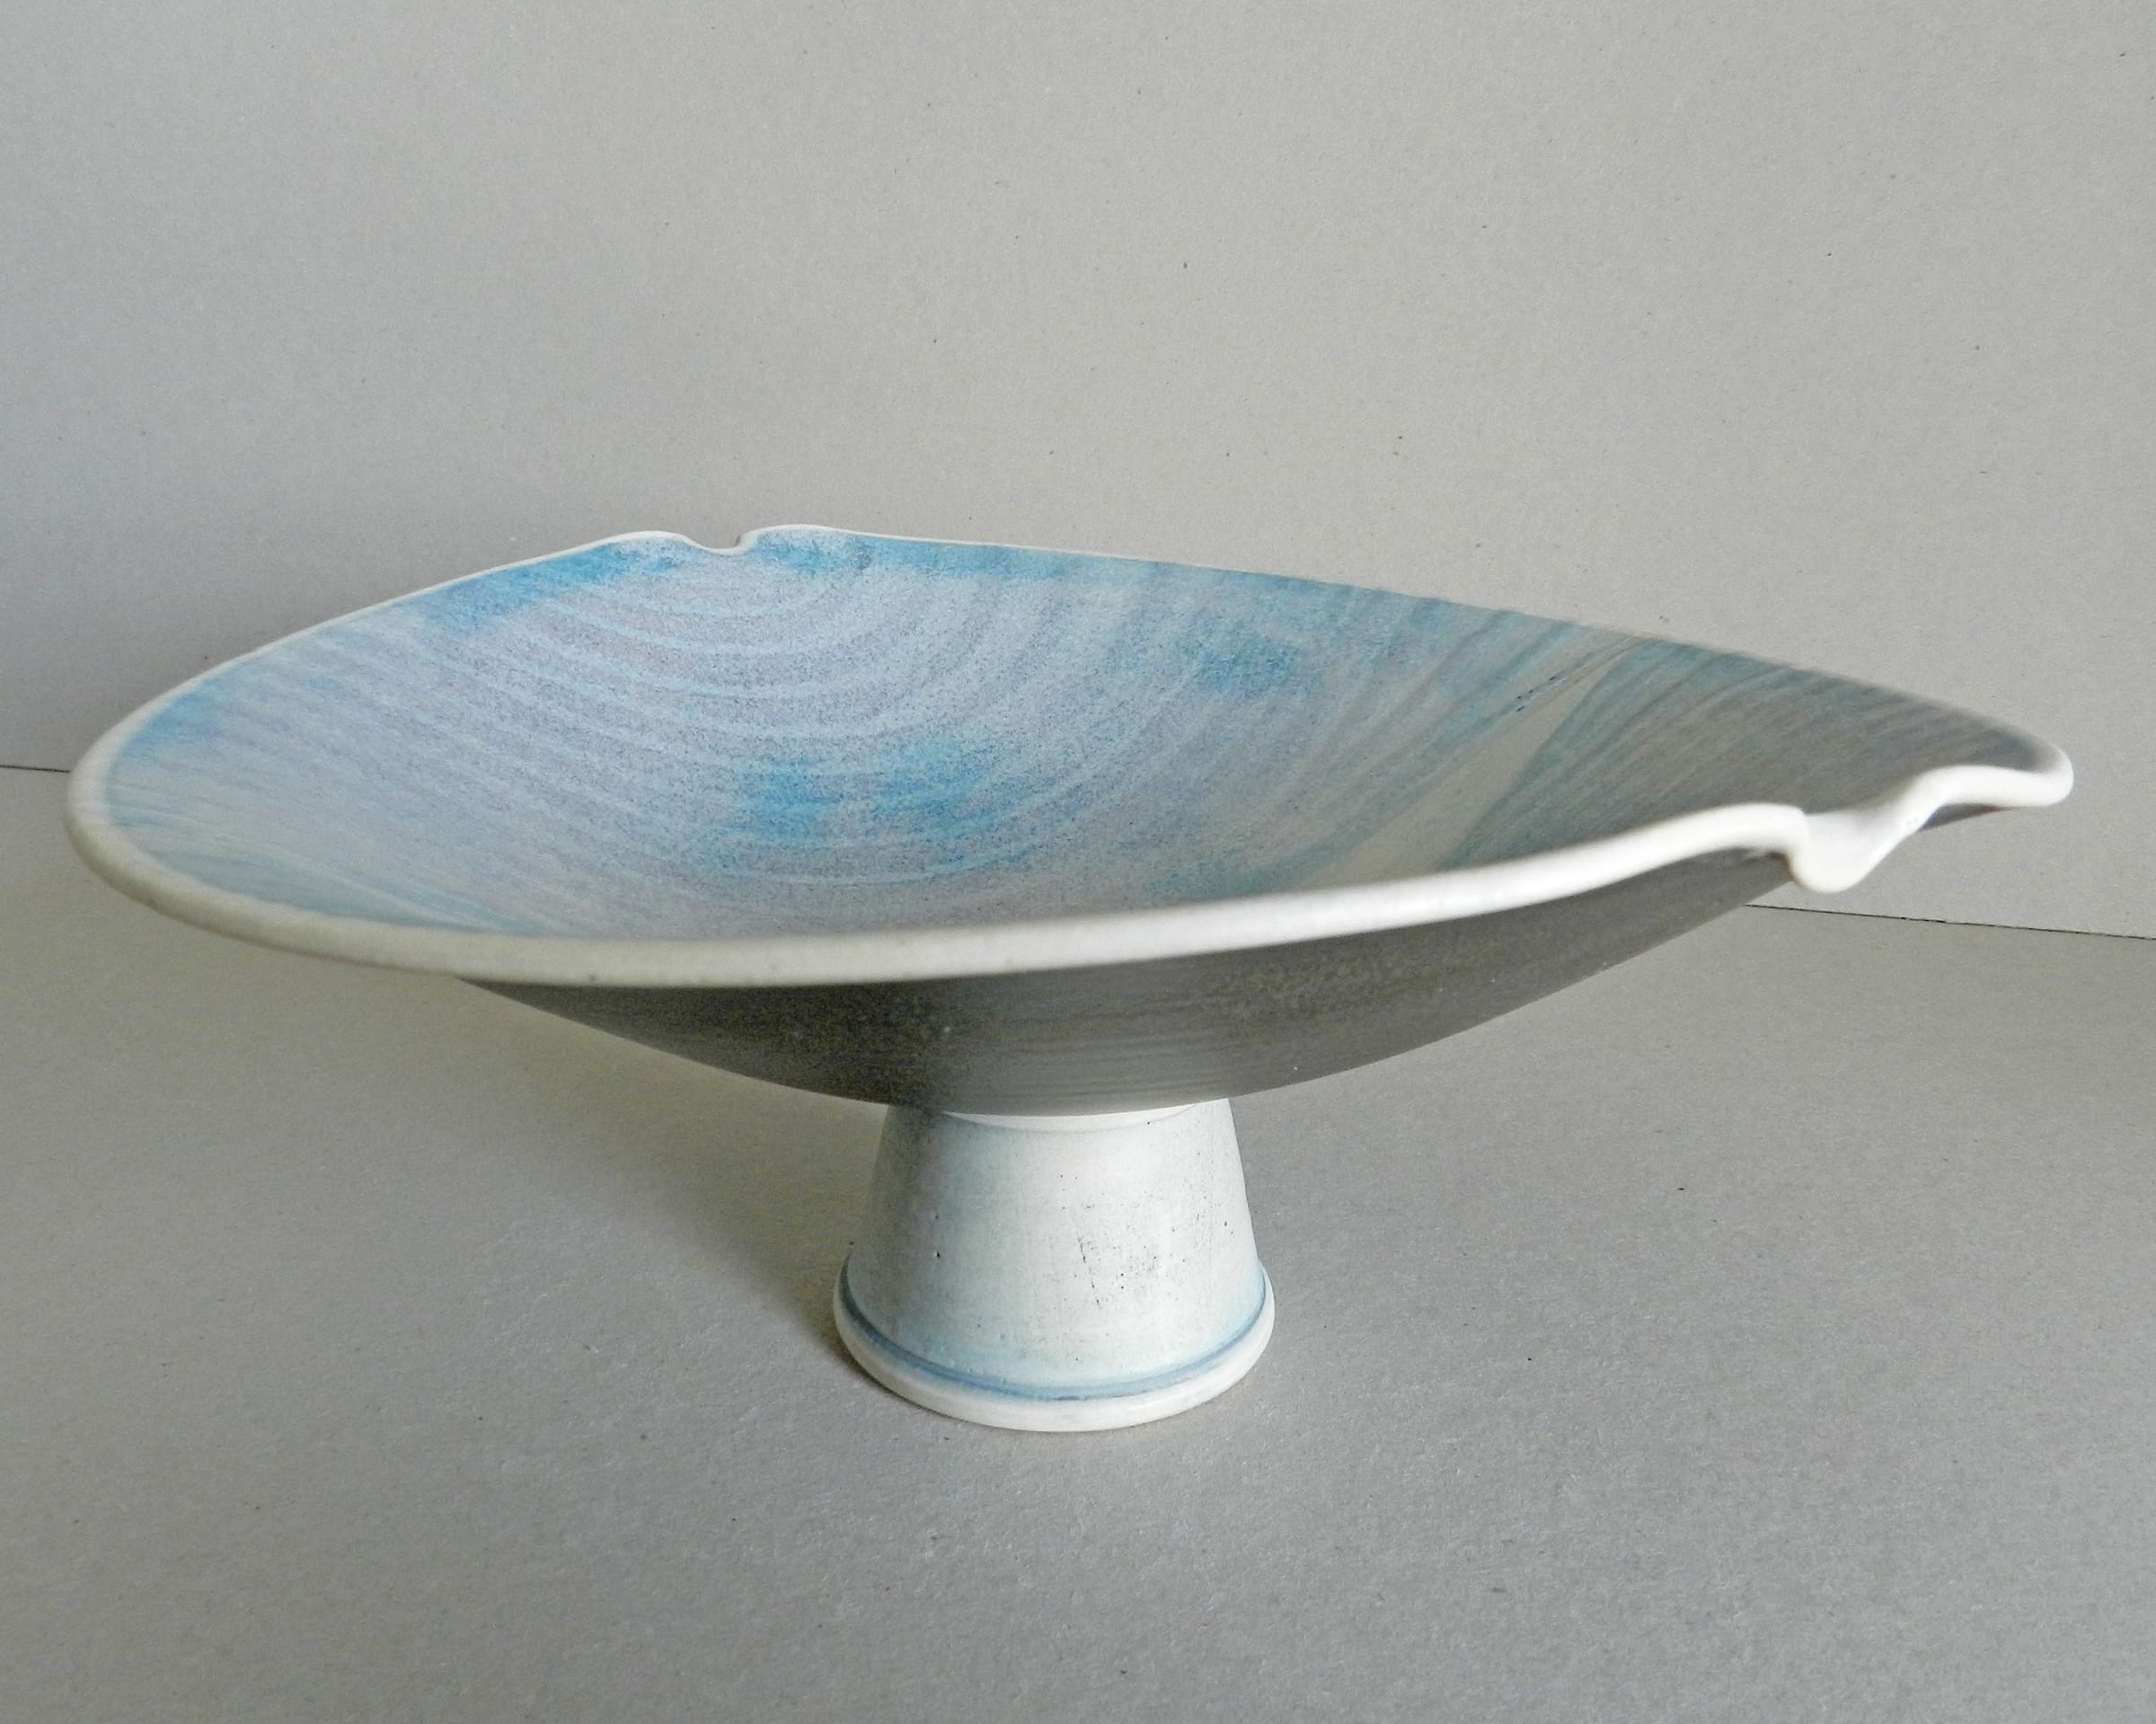 "<span class=""link fancybox-details-link""><a href=""/artists/243-christine-feiler/works/6869-christine-feiler-pedestal-bowl-2019/"">View Detail Page</a></span><div class=""artist""><strong>Christine Feiler</strong></div> b. 1948 <div class=""title""><em>Pedestal bowl</em>, 2019</div> <div class=""signed_and_dated"">Ceramicist mark on base</div> <div class=""medium"">Stoneware with enamels</div><div class=""copyright_line"">Copyright The Artist</div>"